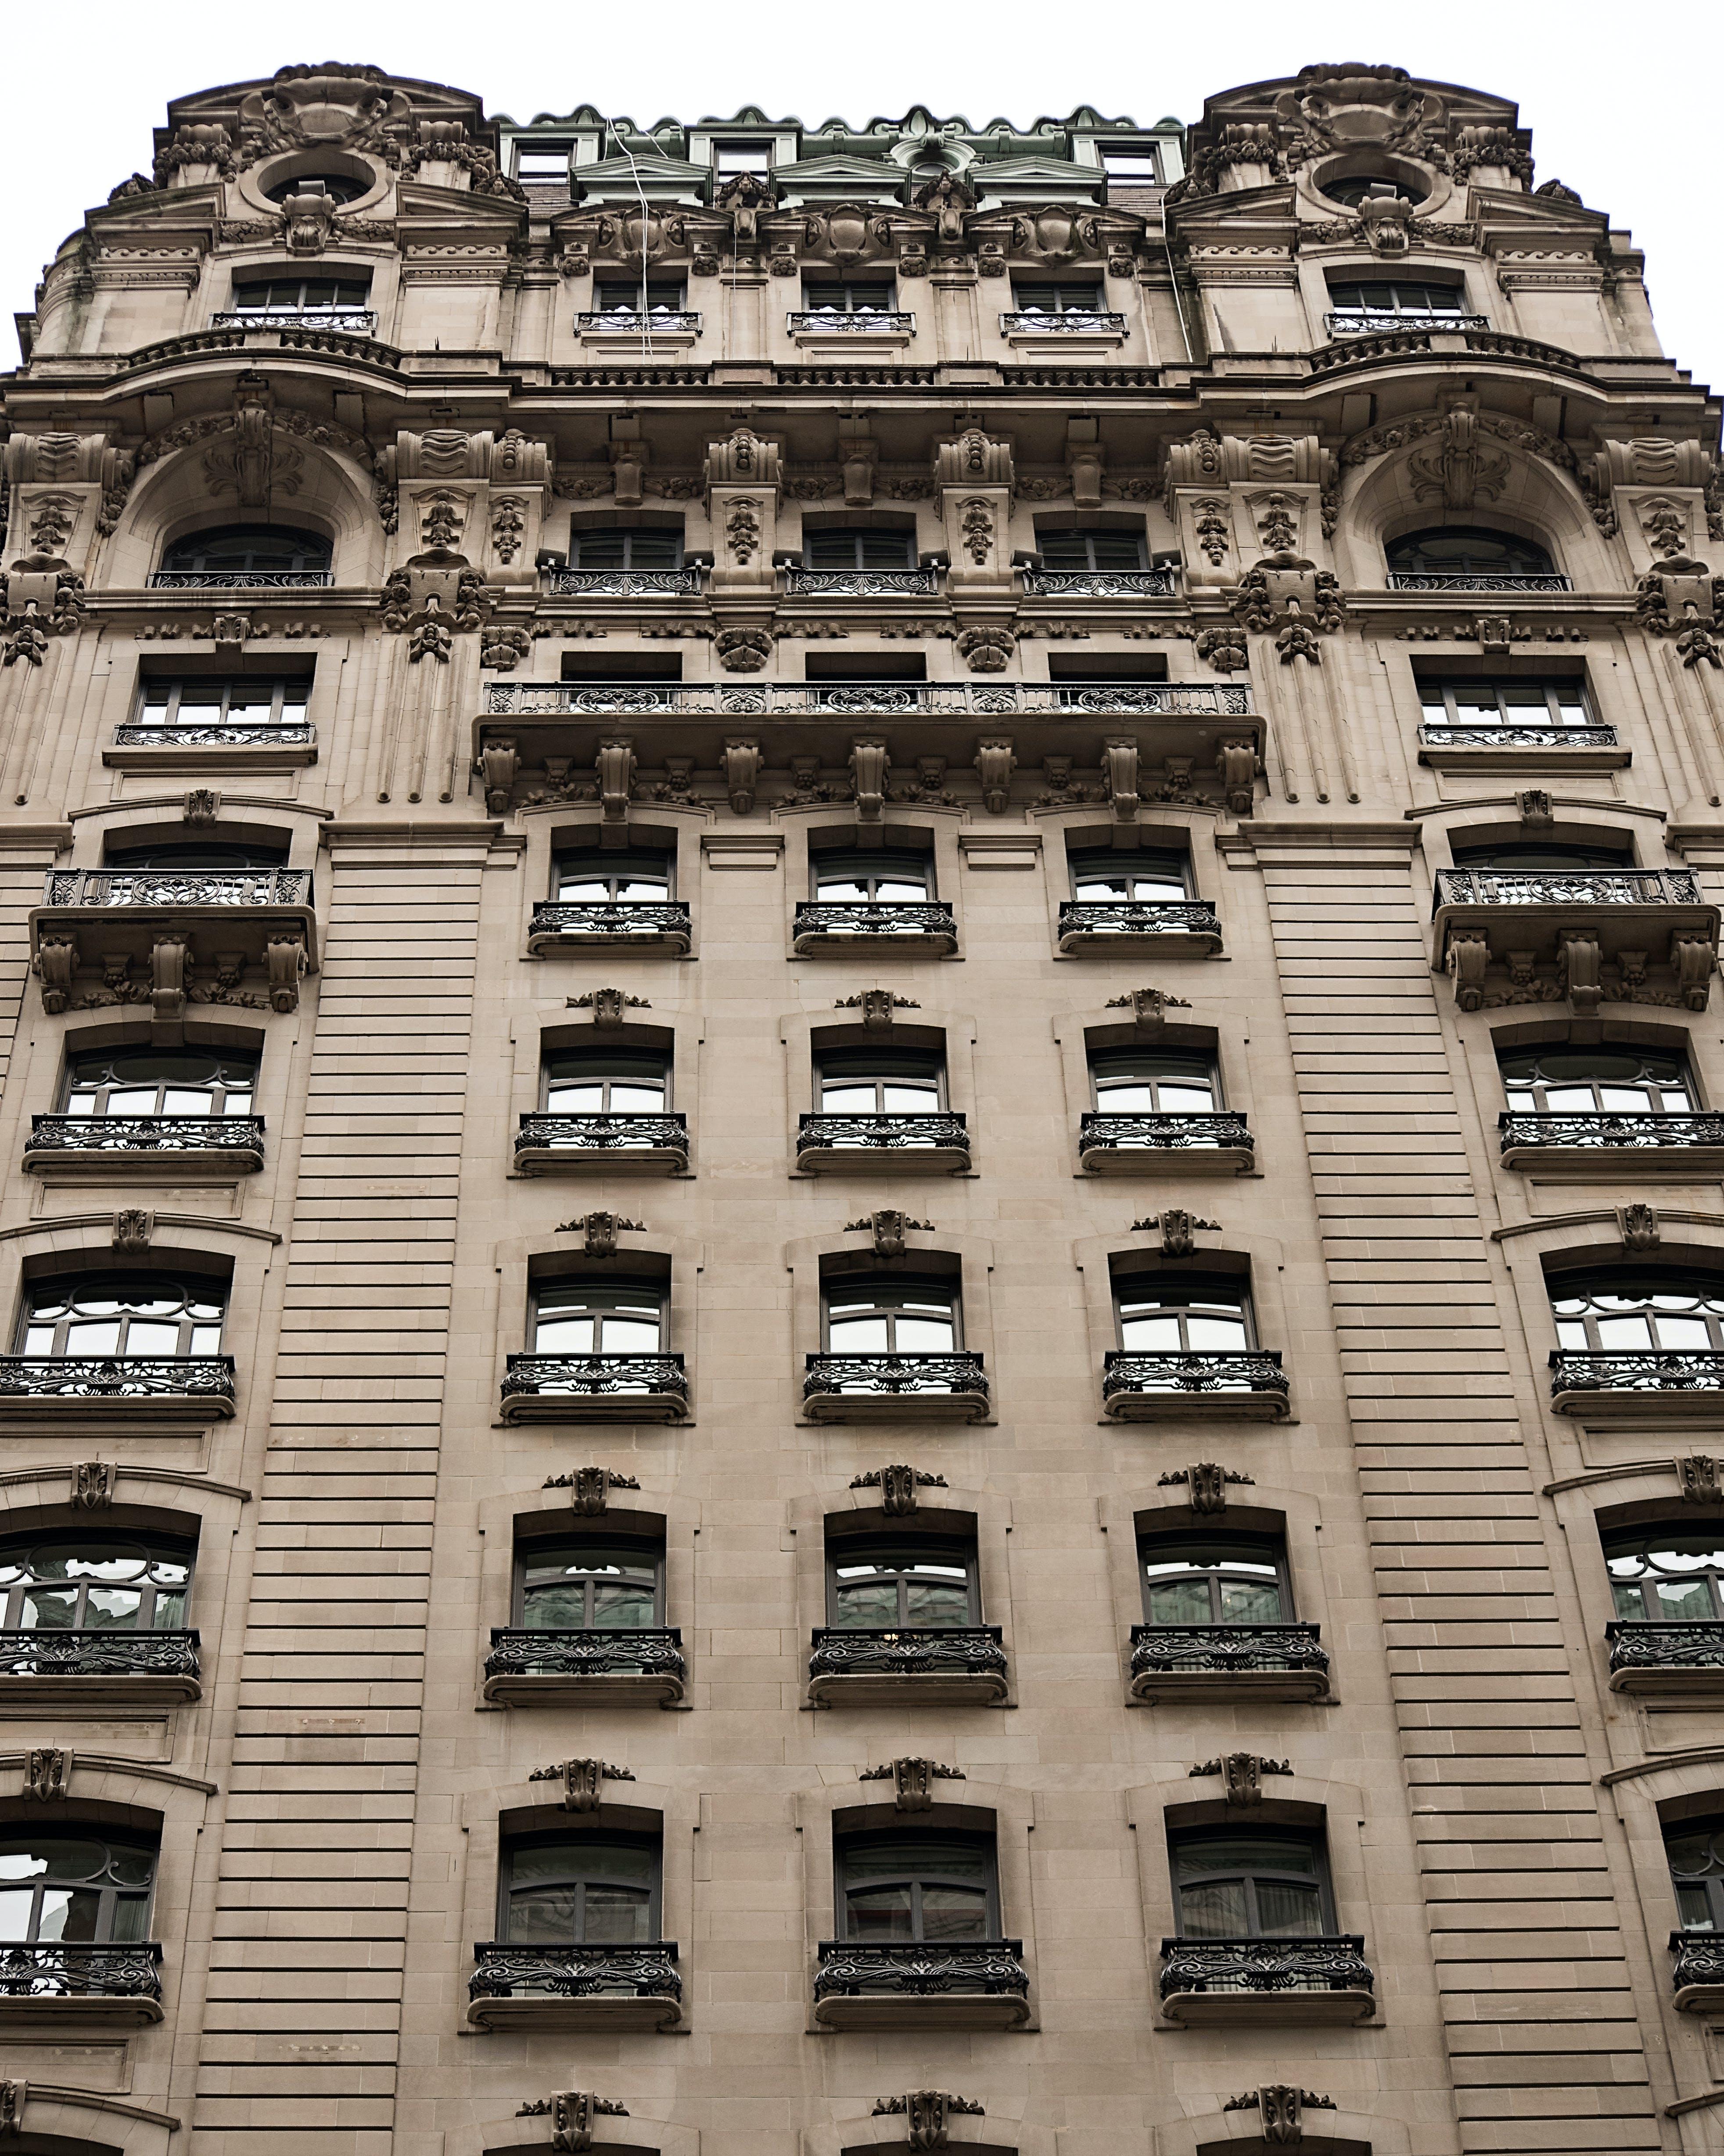 Free stock photo of 19th century buildings, architecture, beautiful buildings, façades